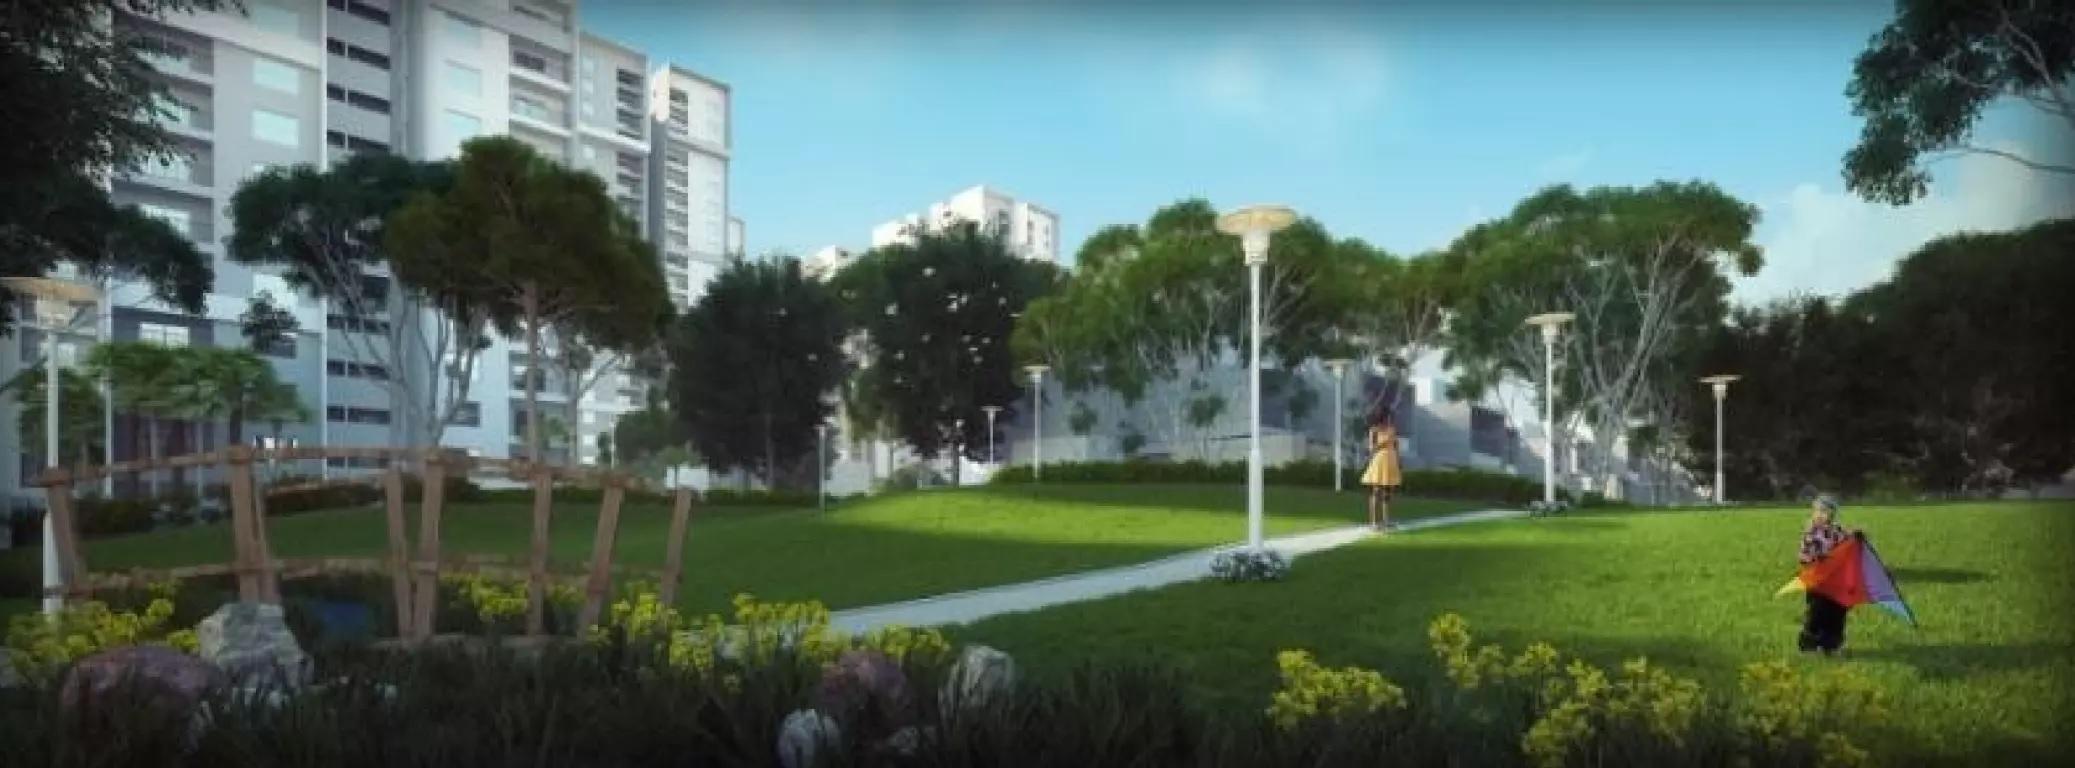 sobha silicon oasis amenities features8